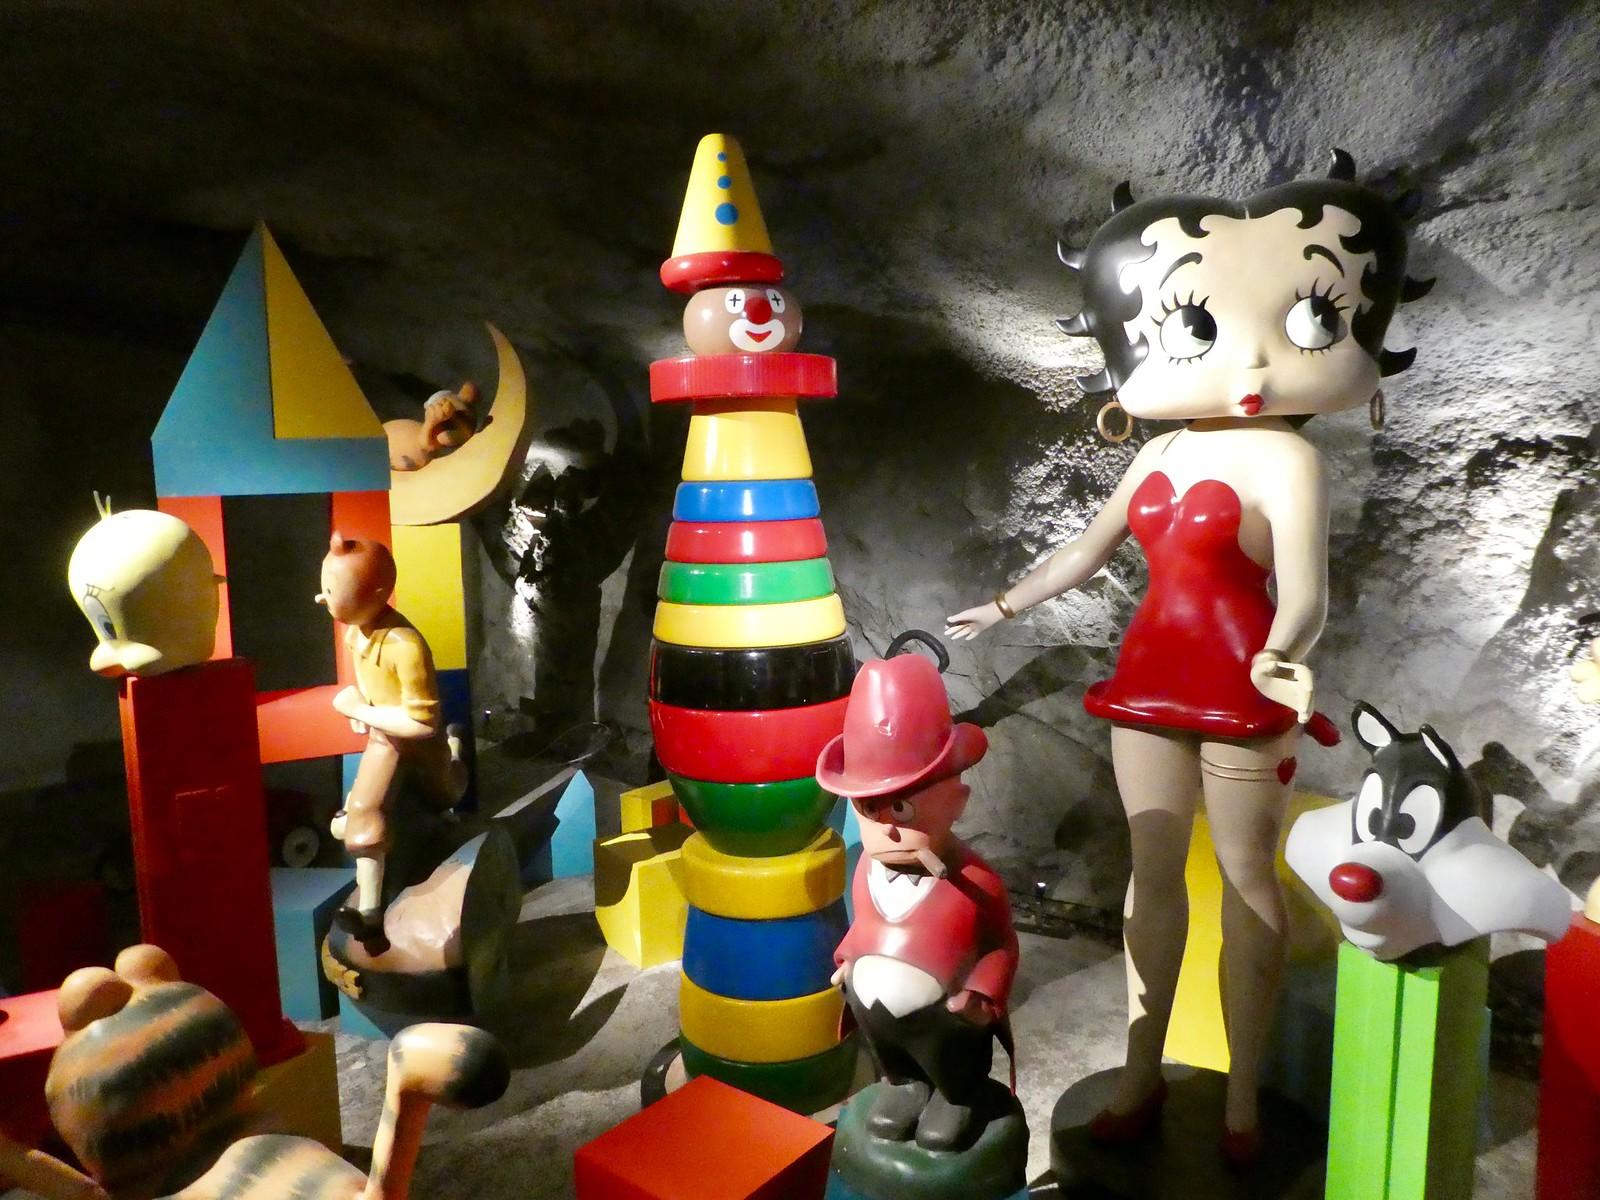 Bergrummet Toy Museum, Stockholm